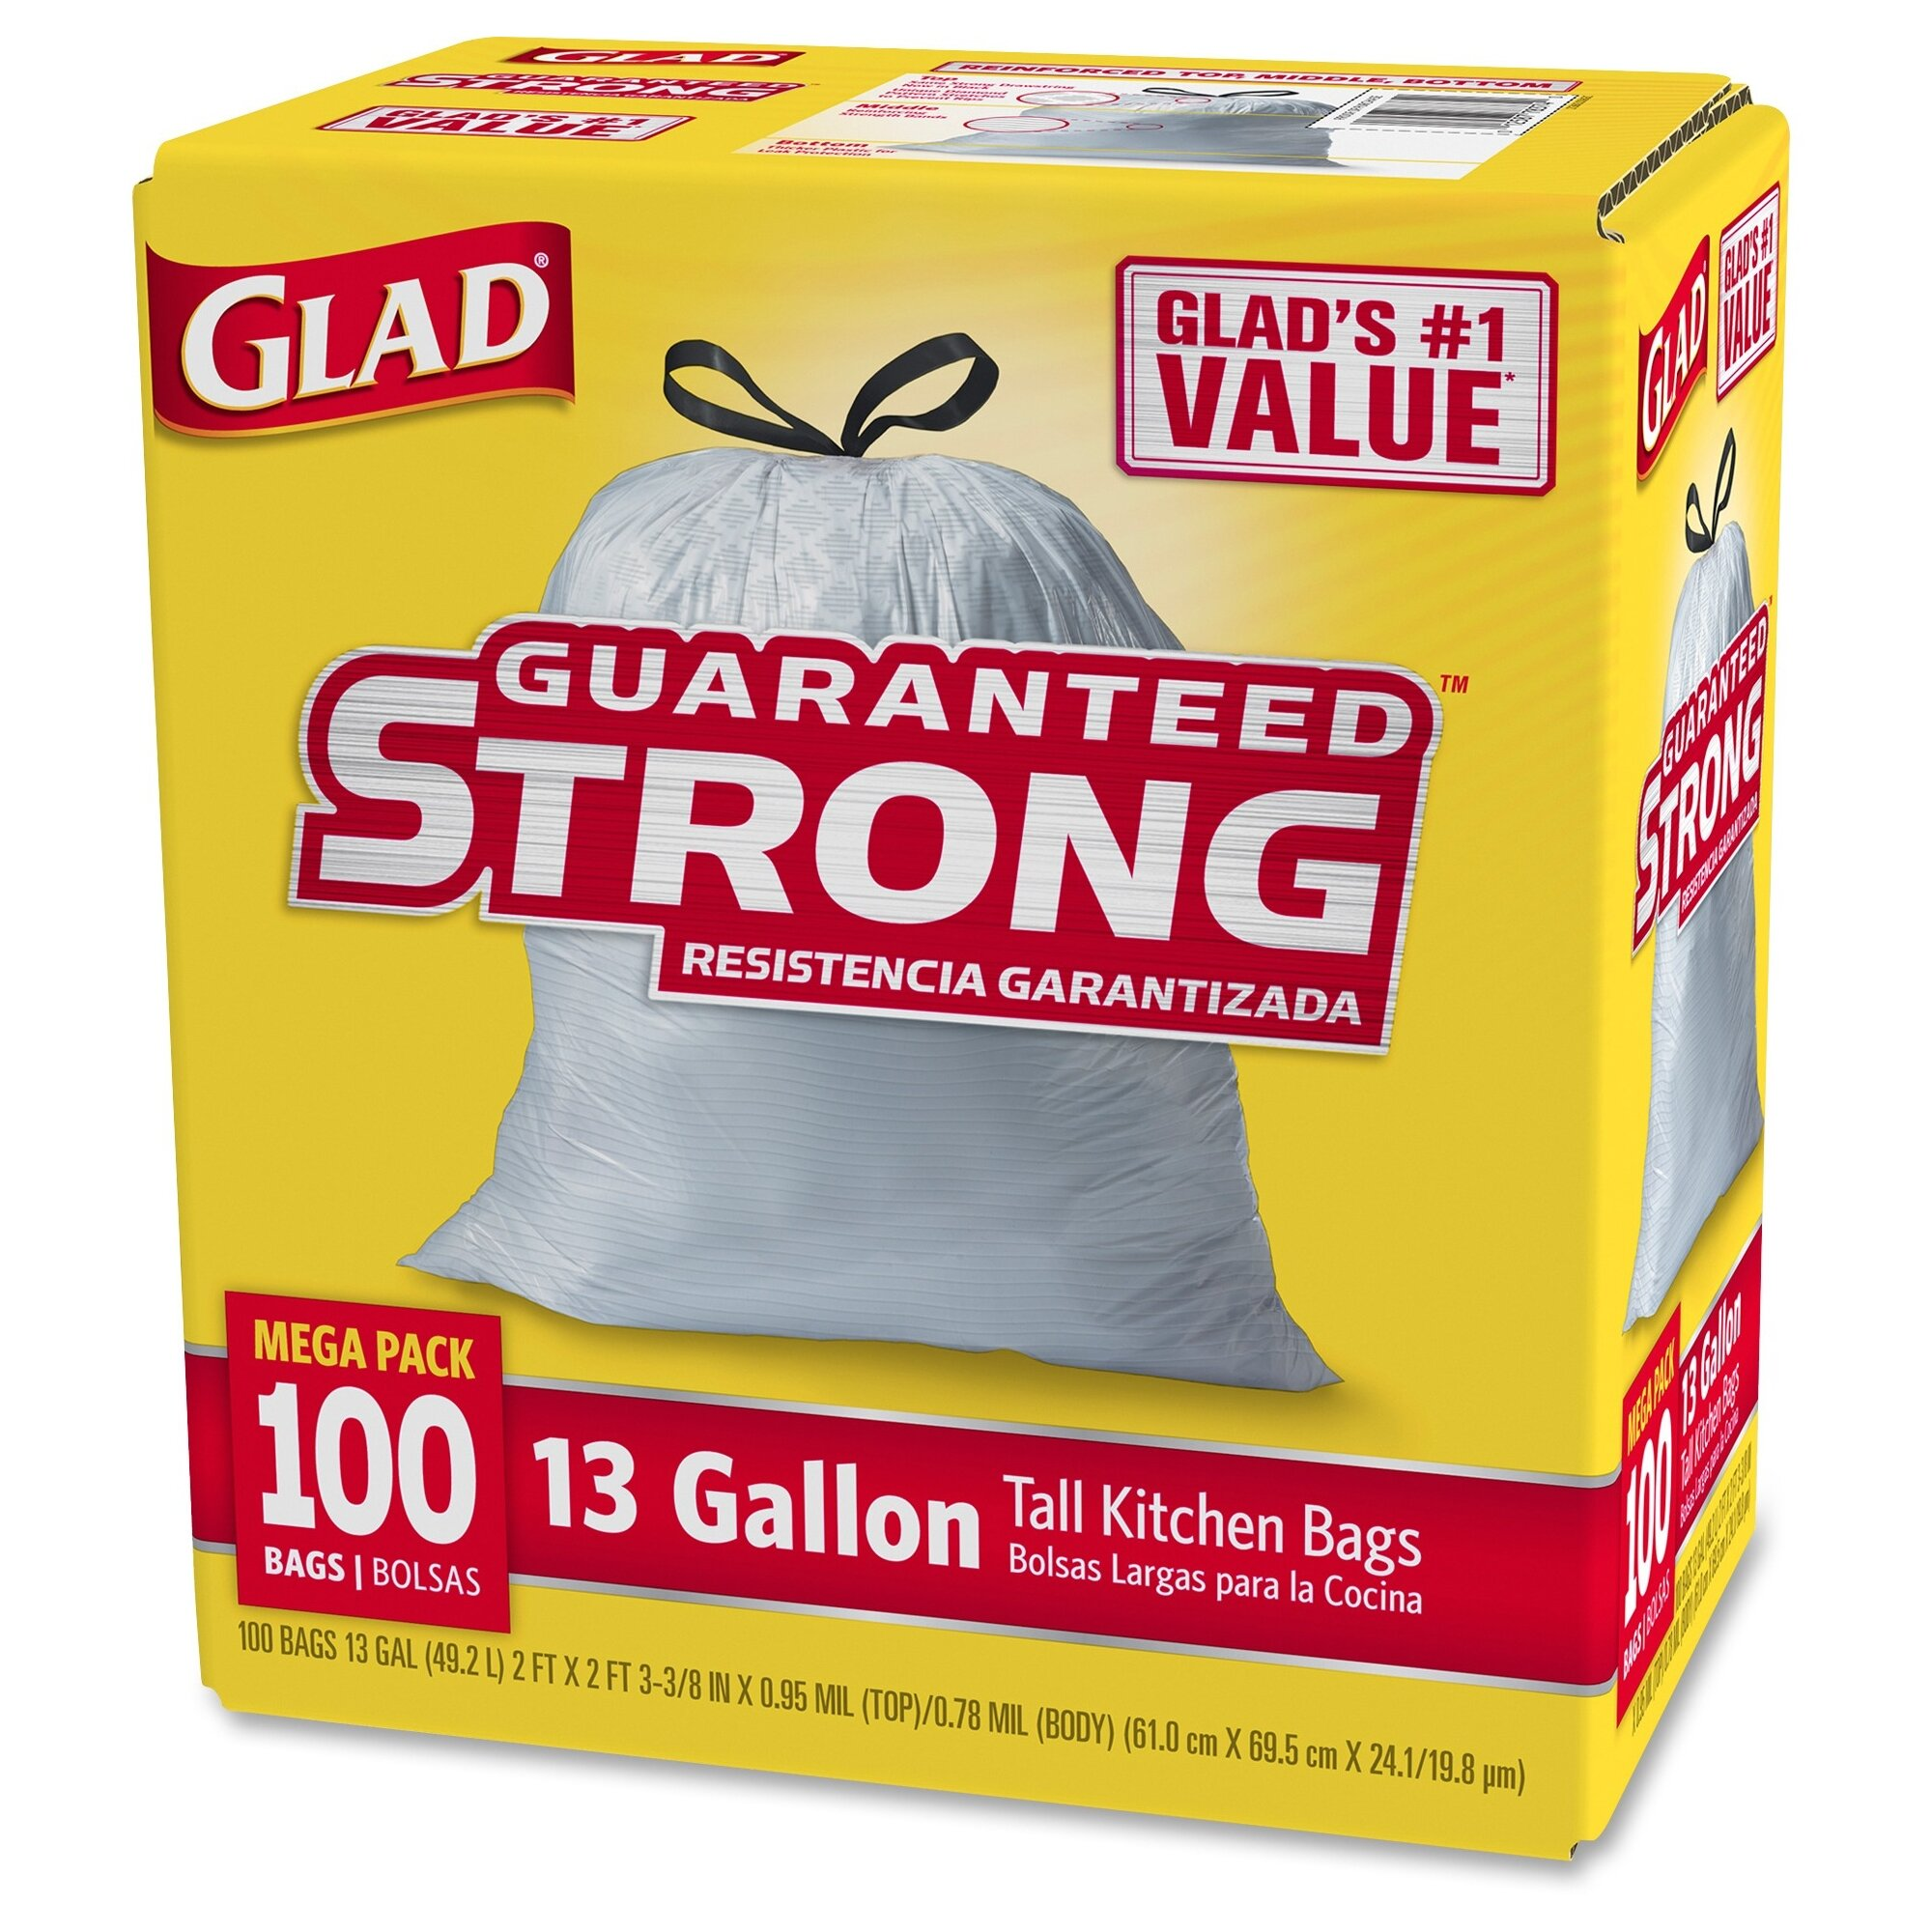 Clorox Glad Tall Kitchen Drawstring 13 Gal Trash Bags 100 Count Reviews Wayfair